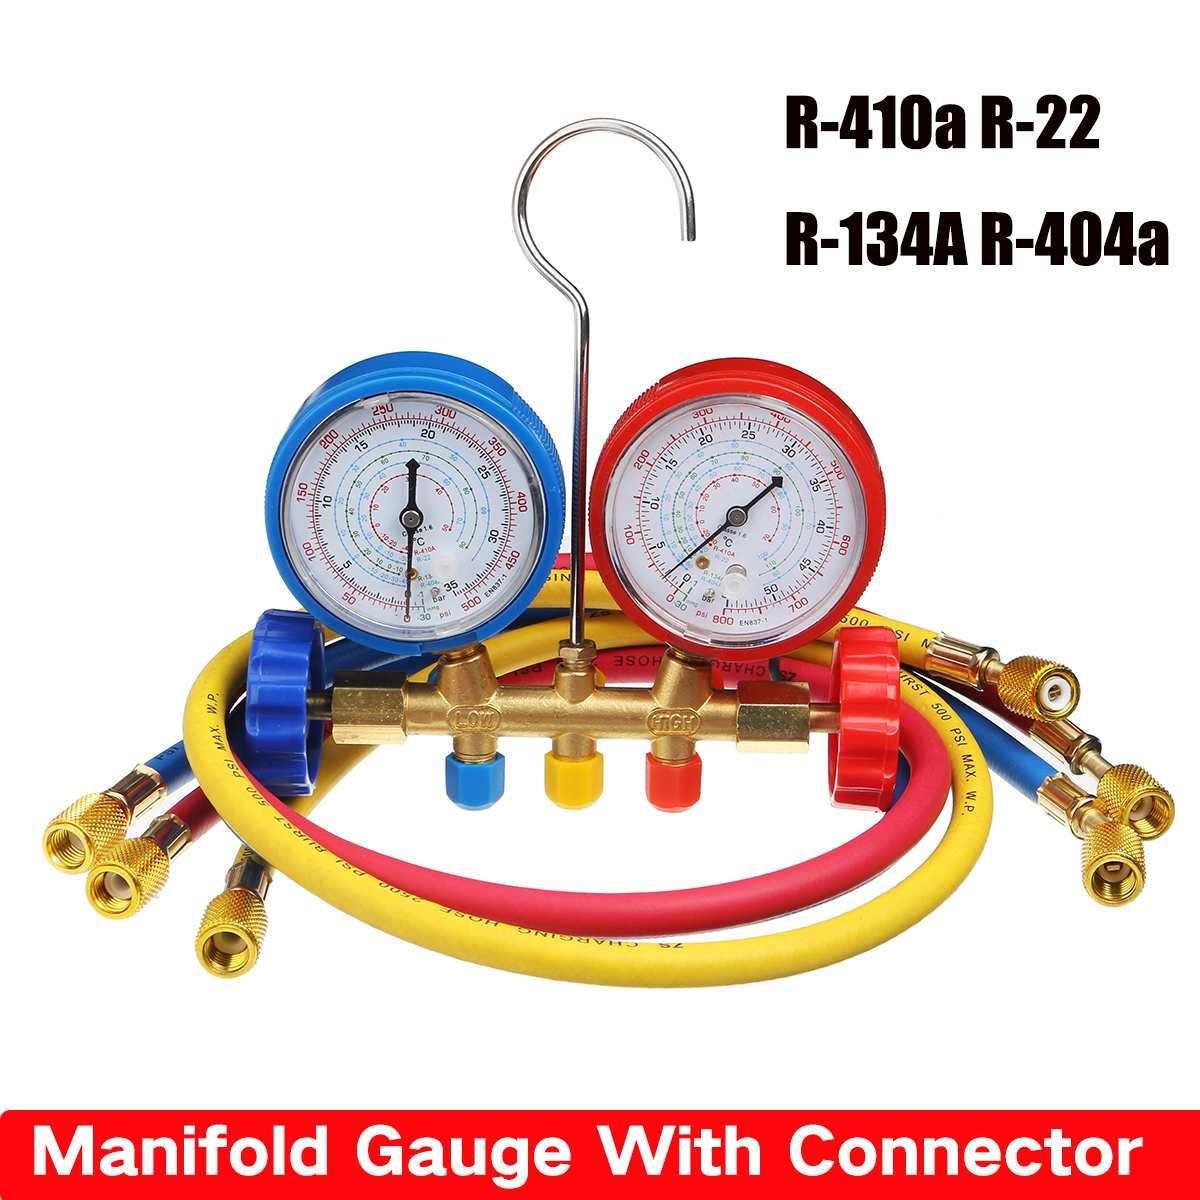 Manifold Gauge With Connector Refrigerant Device  Pressure Gauge Refrigerant Filling Device High-precision R410a R22 R134a R40